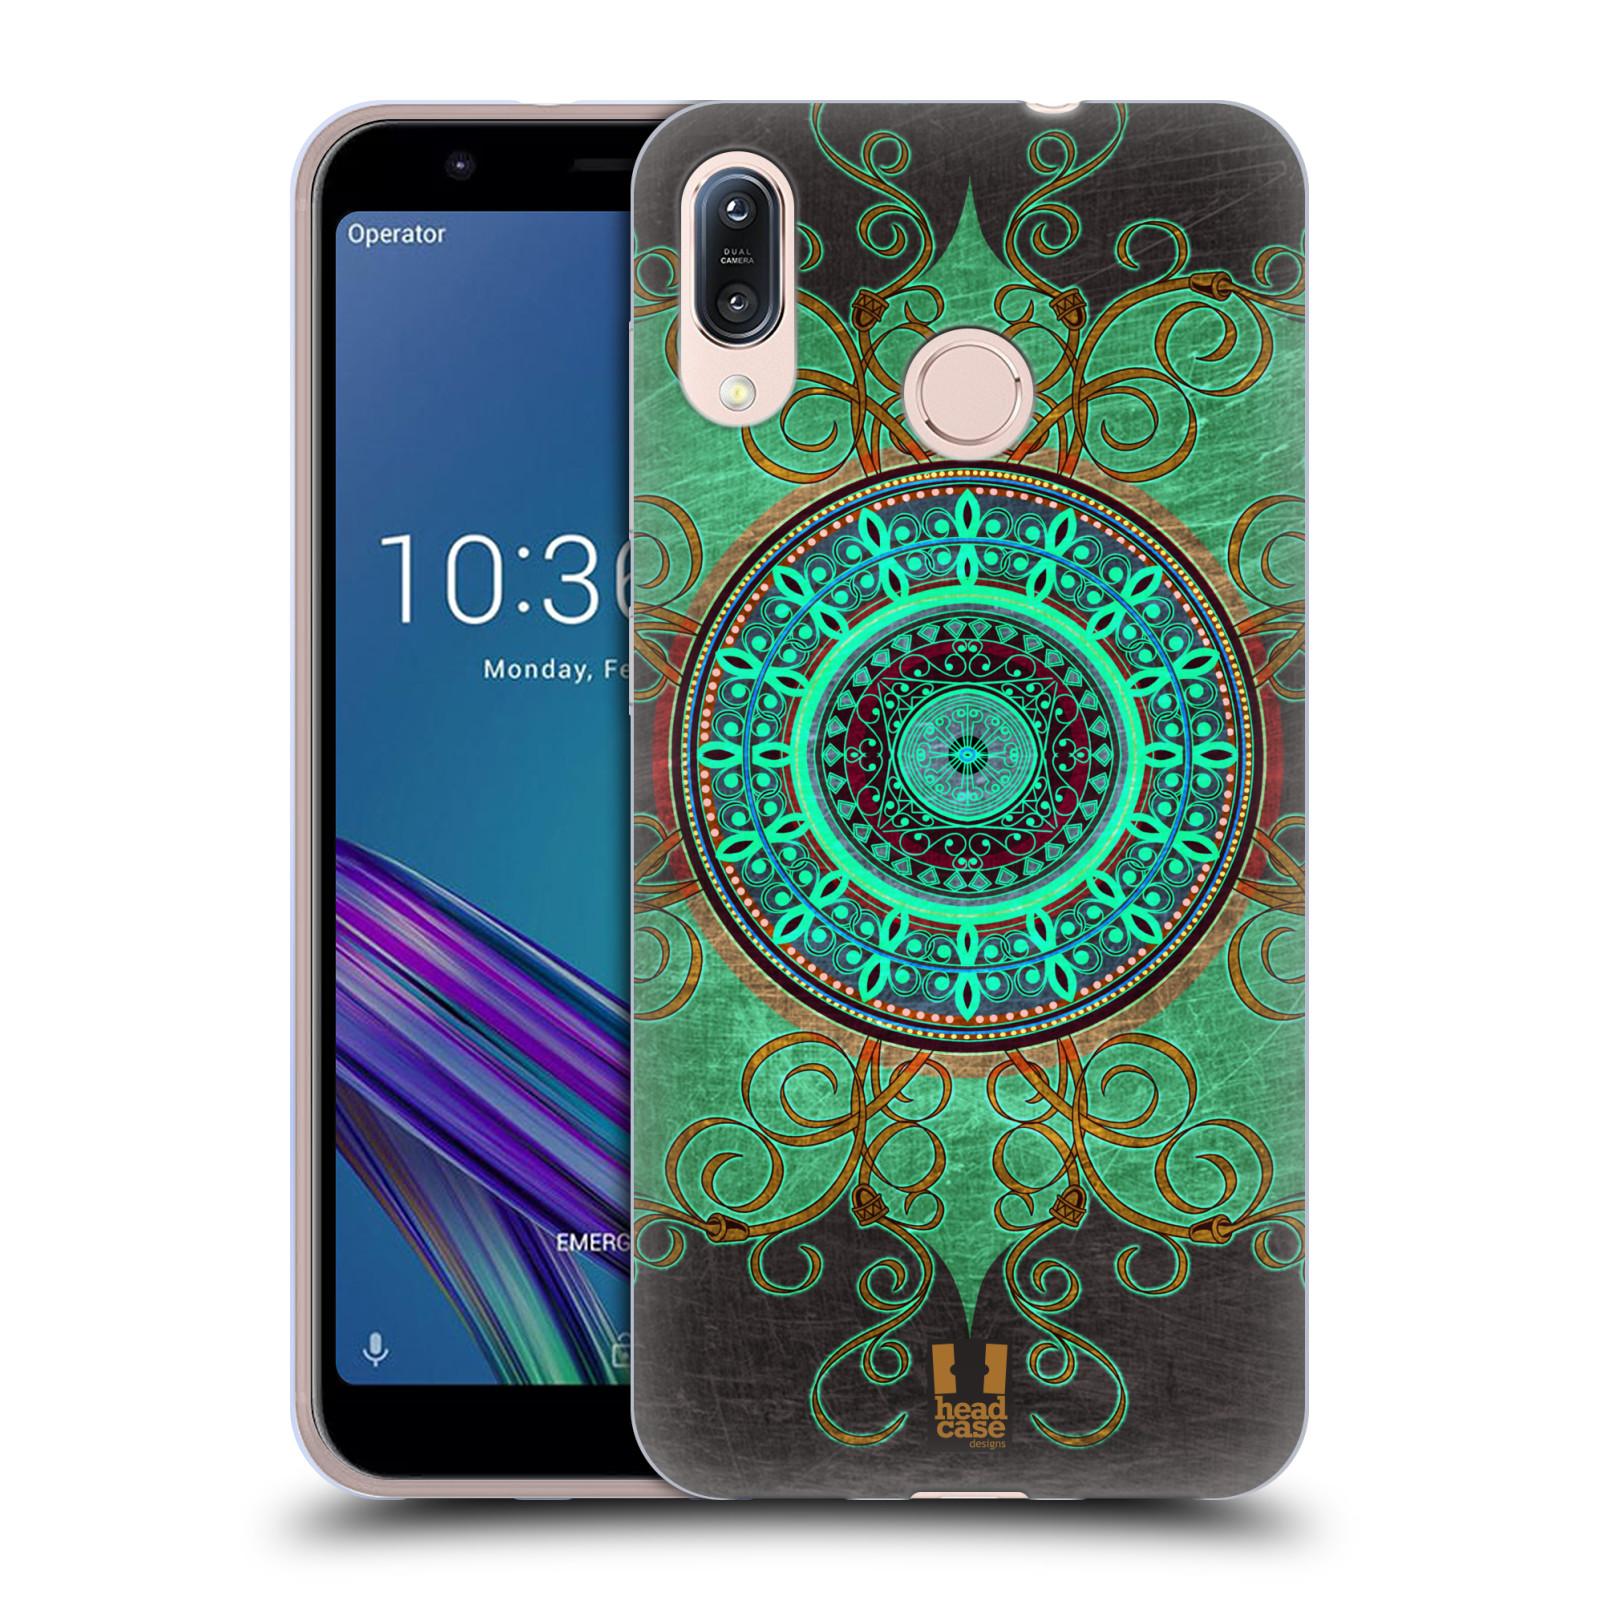 Silikonové pouzdro na mobil Asus Zenfone Max M1 ZB555KL - Head Case - ARAB MANDALA